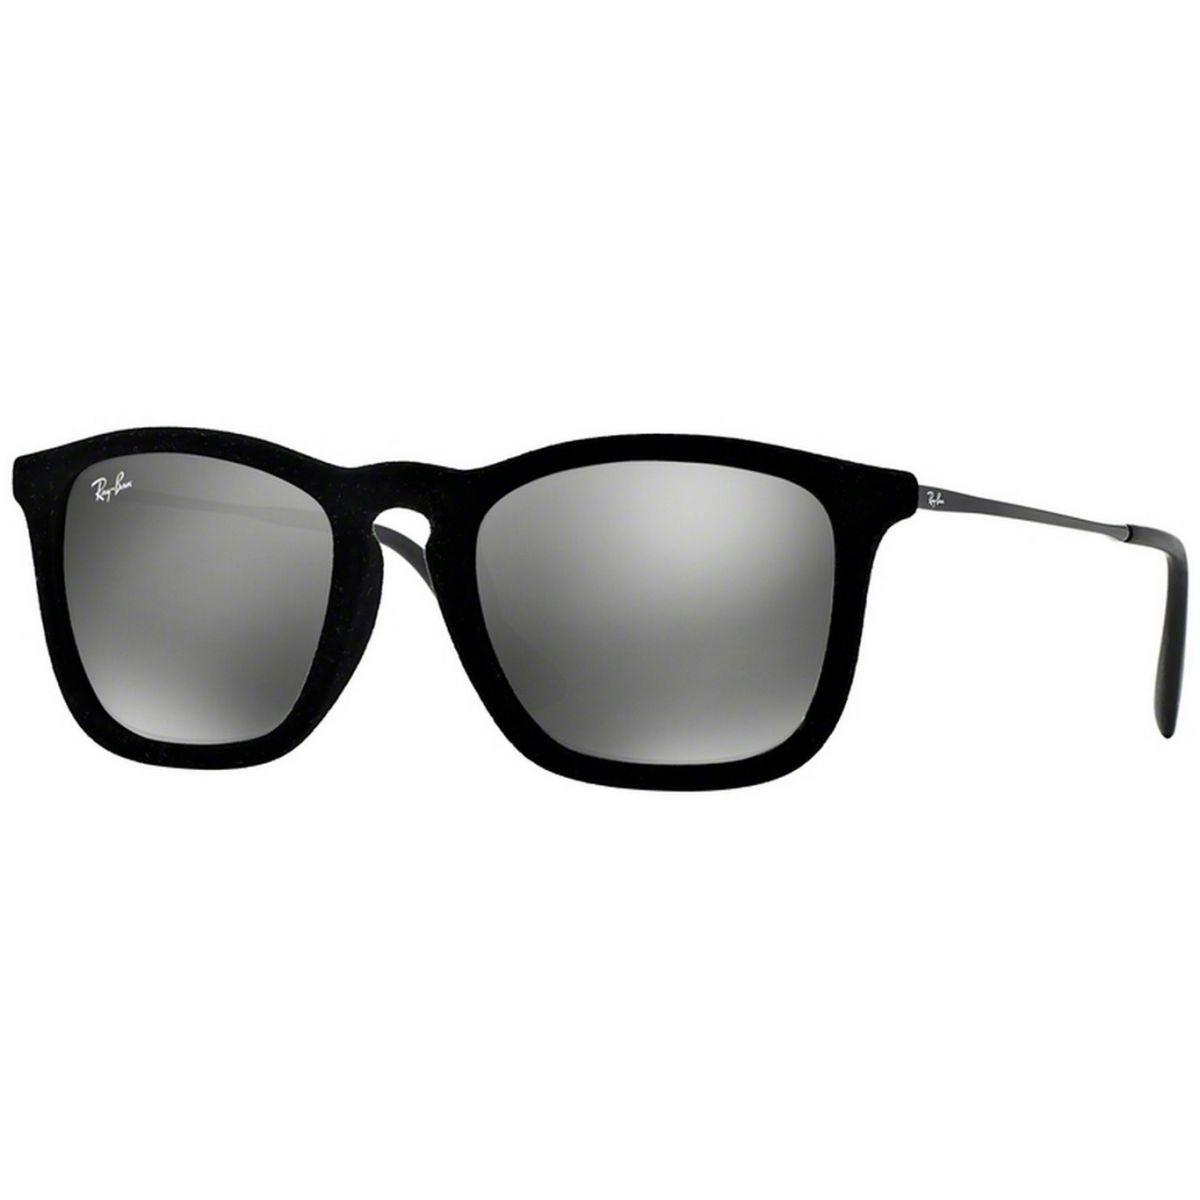 8f0b09627b52b2 Óculos De Sol Ray Ban Chris Veludo RB4187 60756G Tam.54   Eyewear in ...